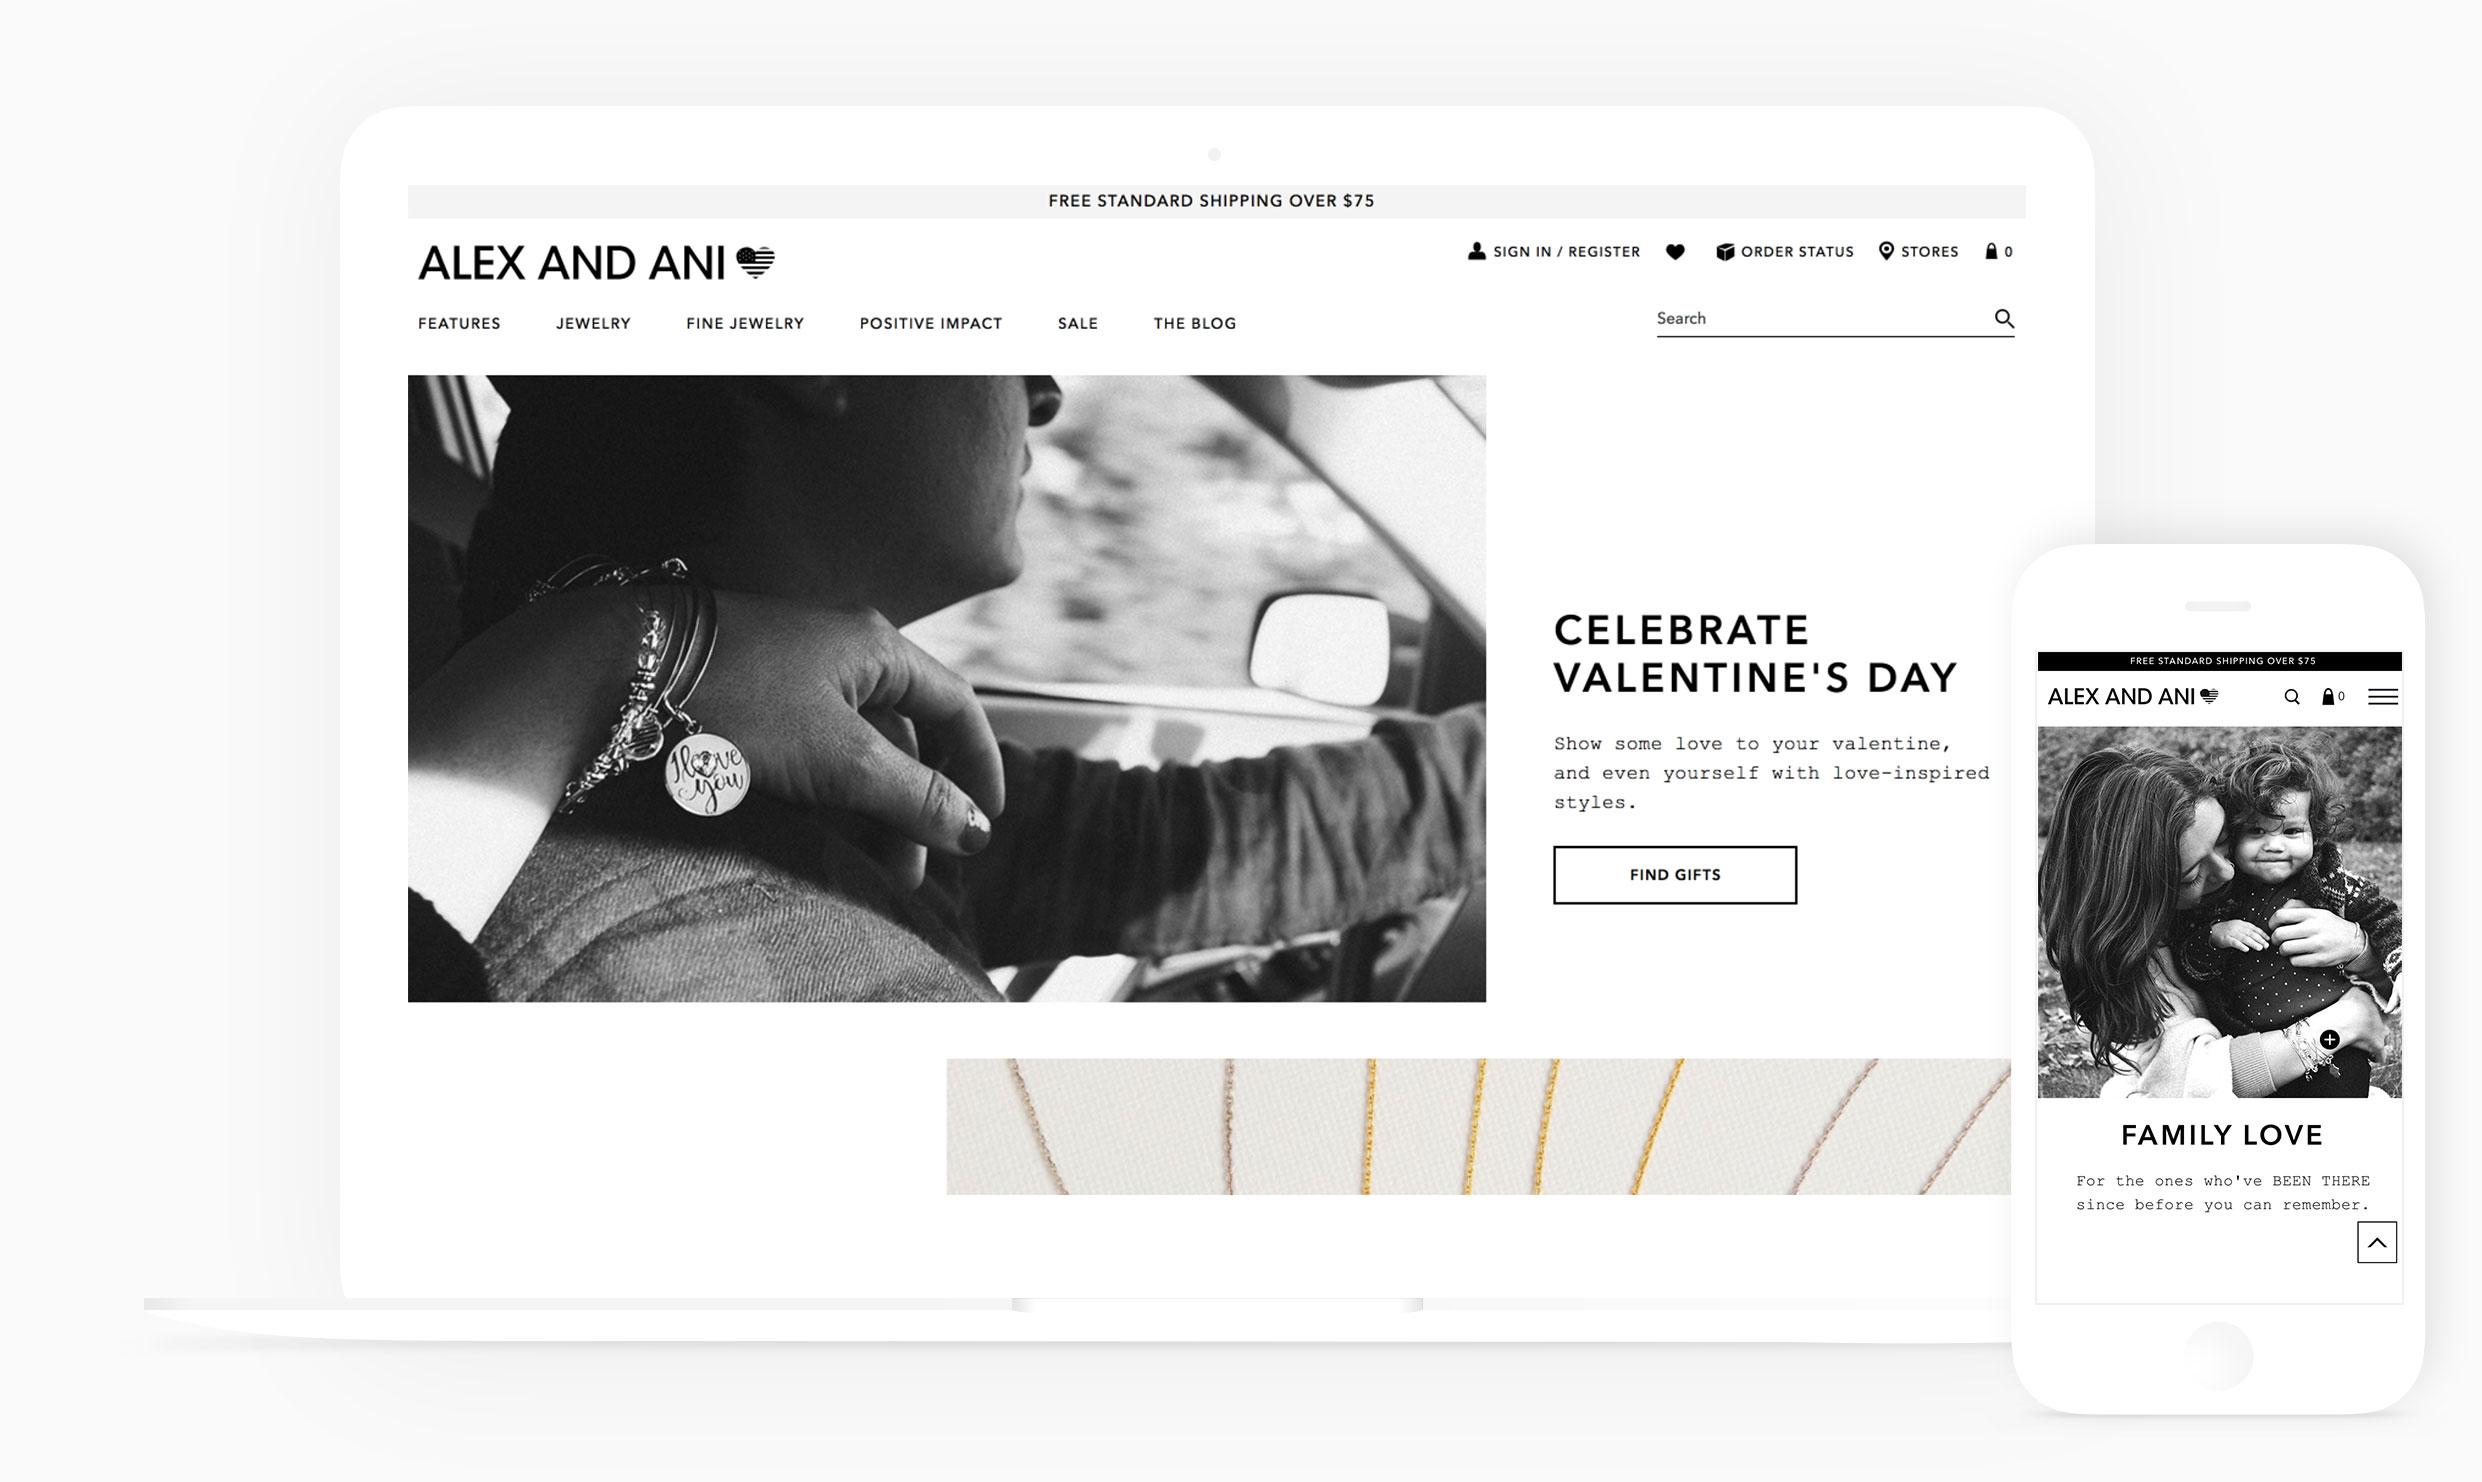 alexandani-ad-advertisement-brand-partnership-lvg-lauravanessagonzalez-design-graphic-design-type-typeography-fashion-art-artist-photography-2.jpg